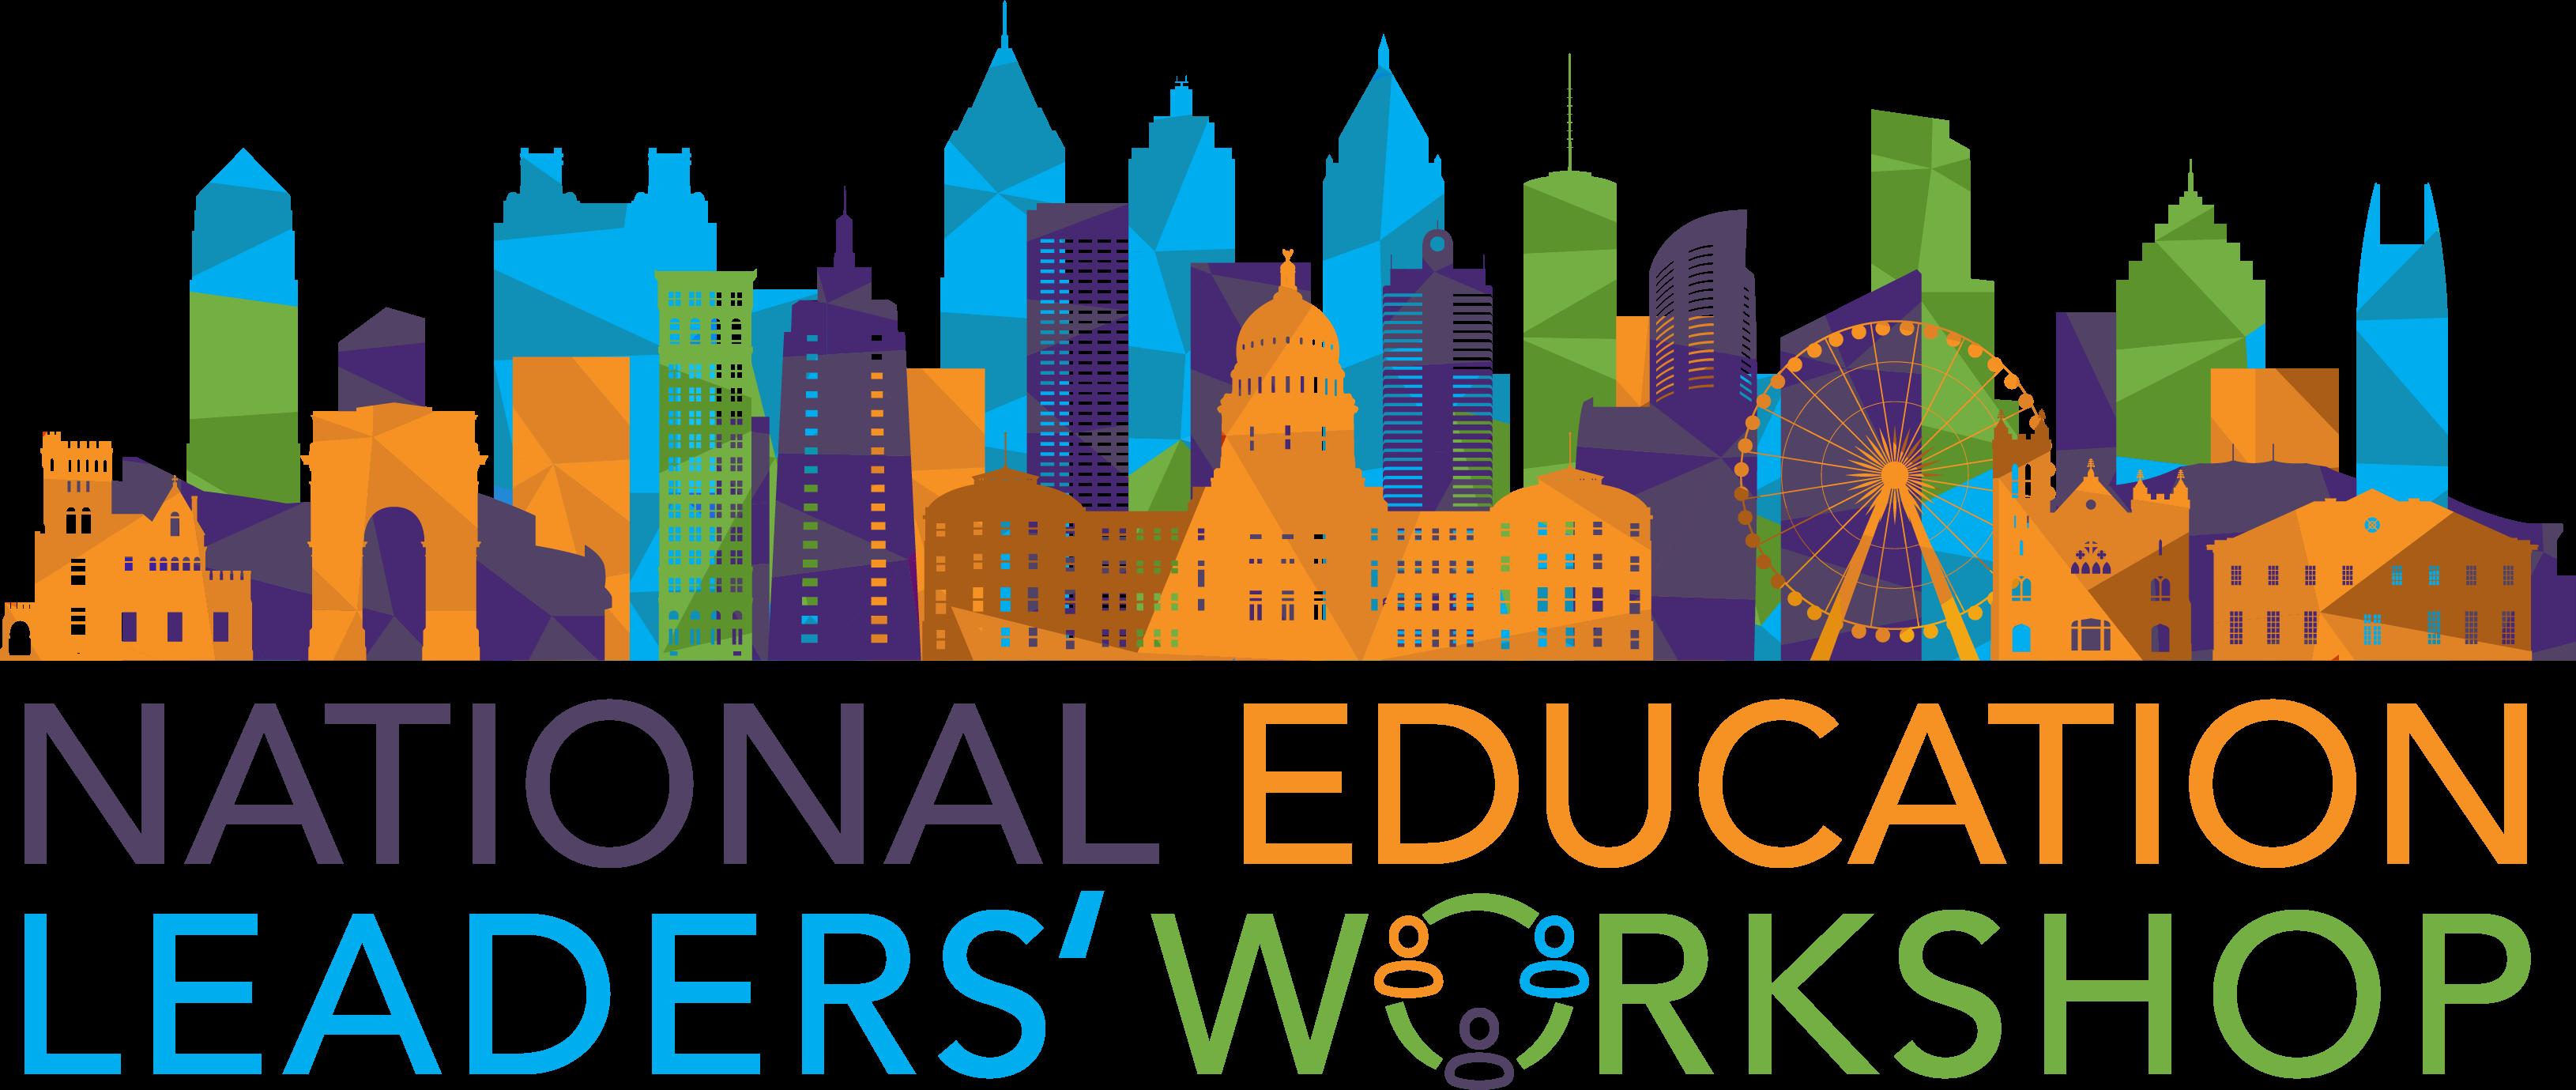 National Education Leaders' Workshop - NELW 2020